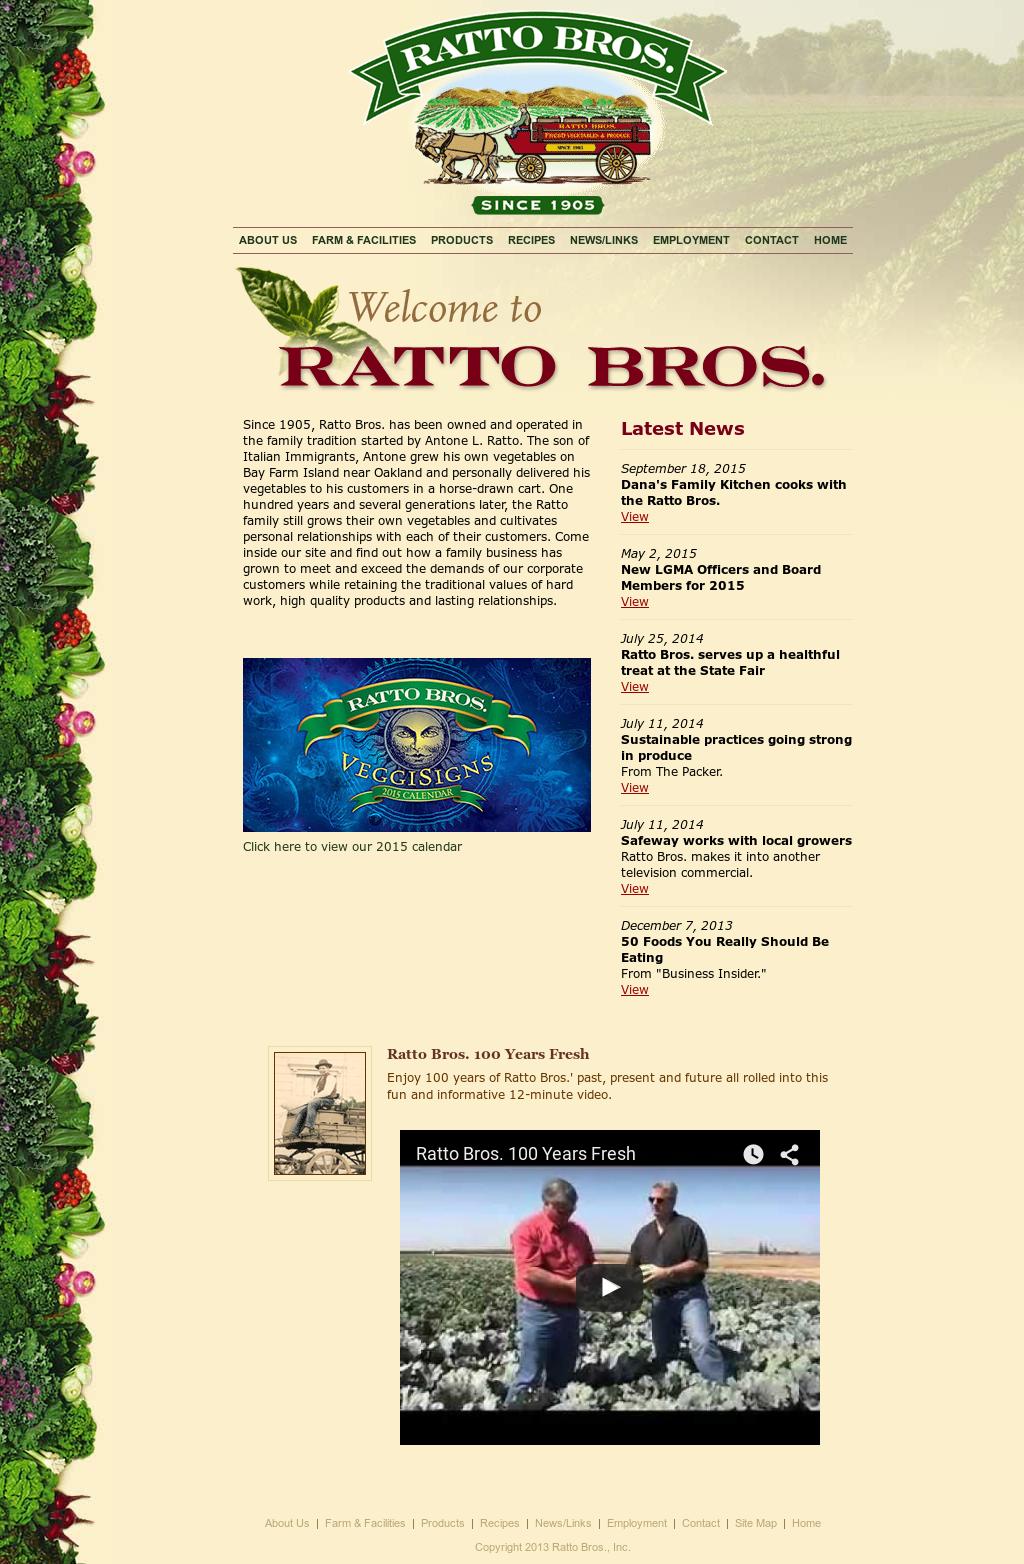 Ratto Bros Competitors, Revenue and Employees - Owler Company Profile